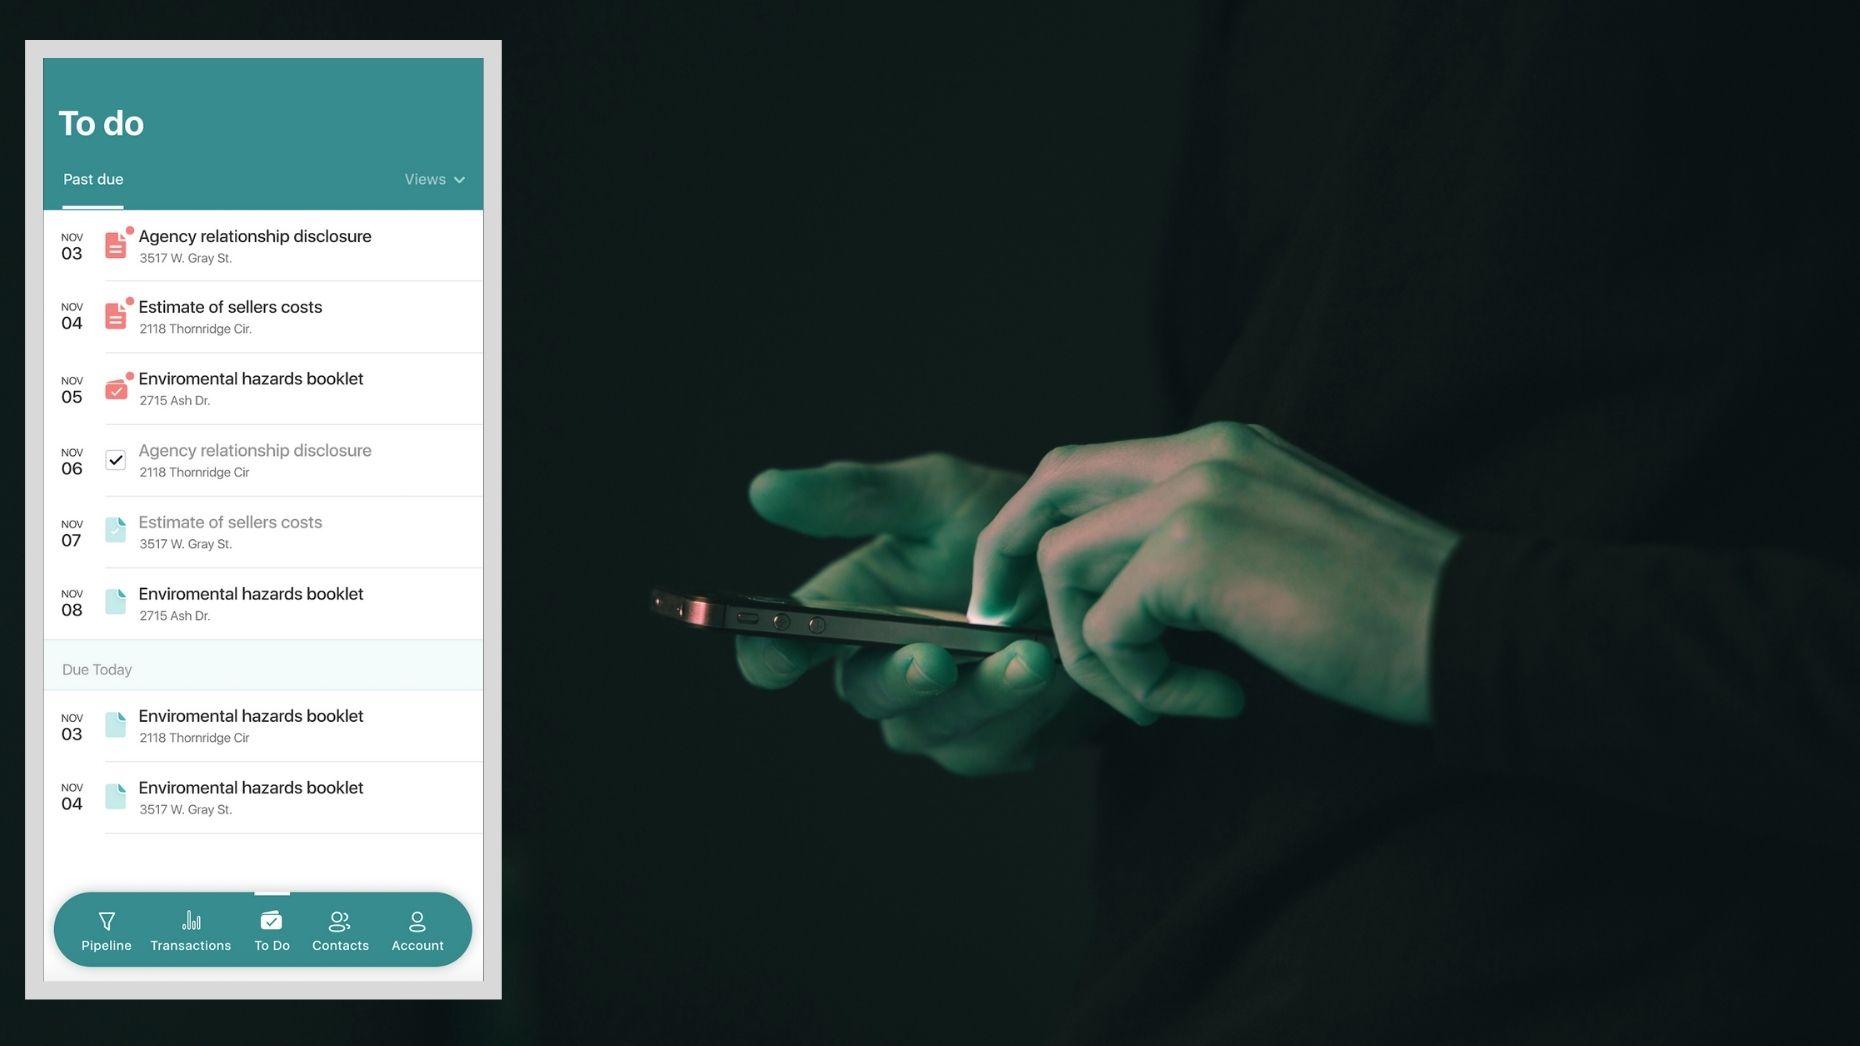 Brokermint adds eSignature and mobile app to platform